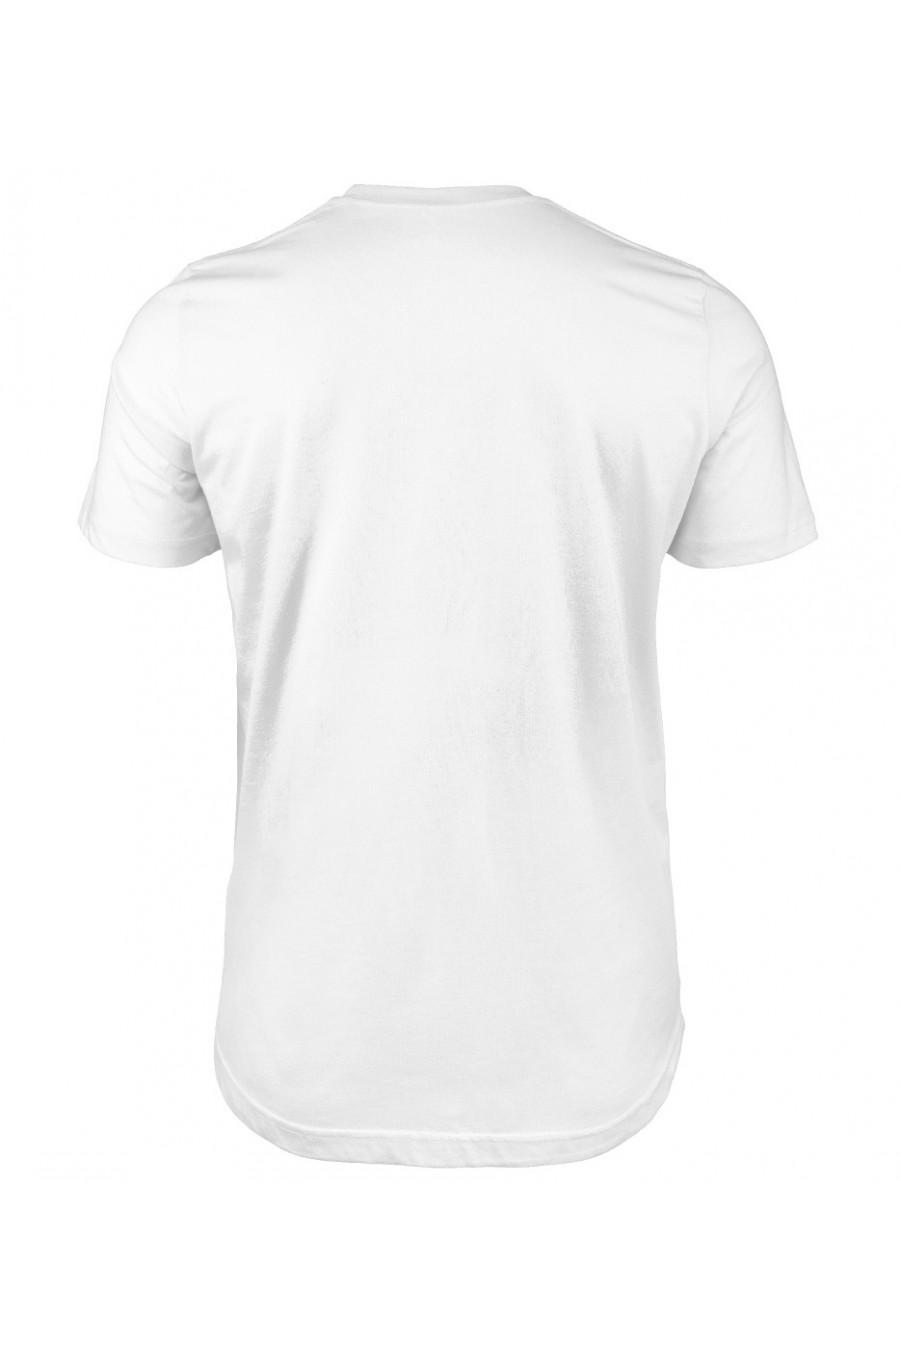 Koszulka Męska Każdy Facet Może Być Ojcem